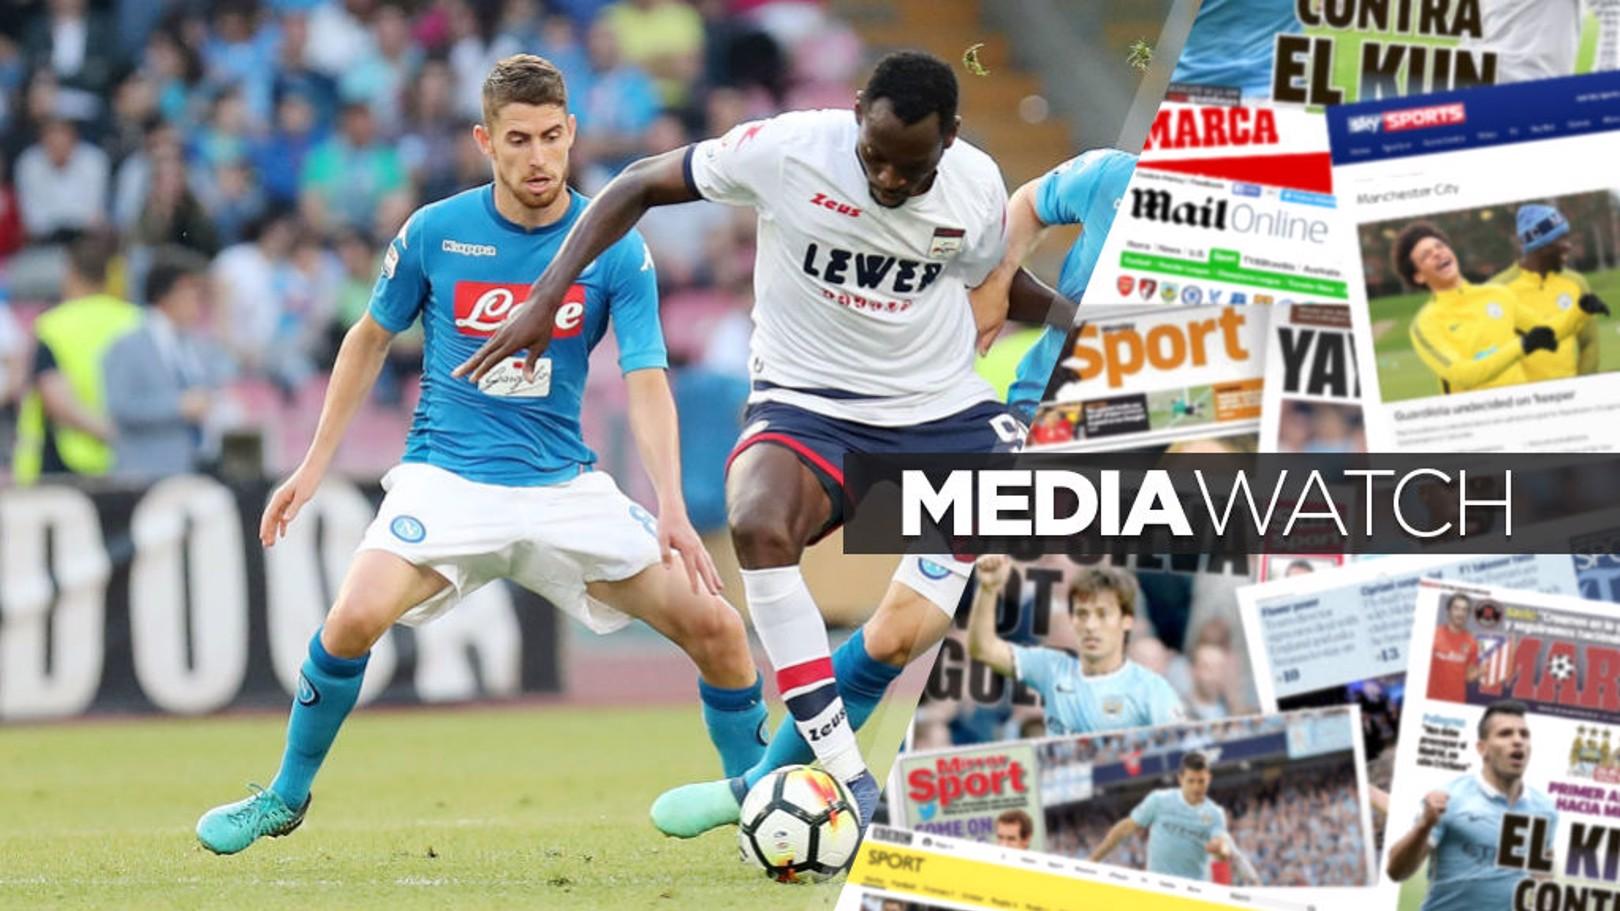 MEDIA WATCHㅣ에당 아자르, 조르지뉴 그리고 리야드 마레즈